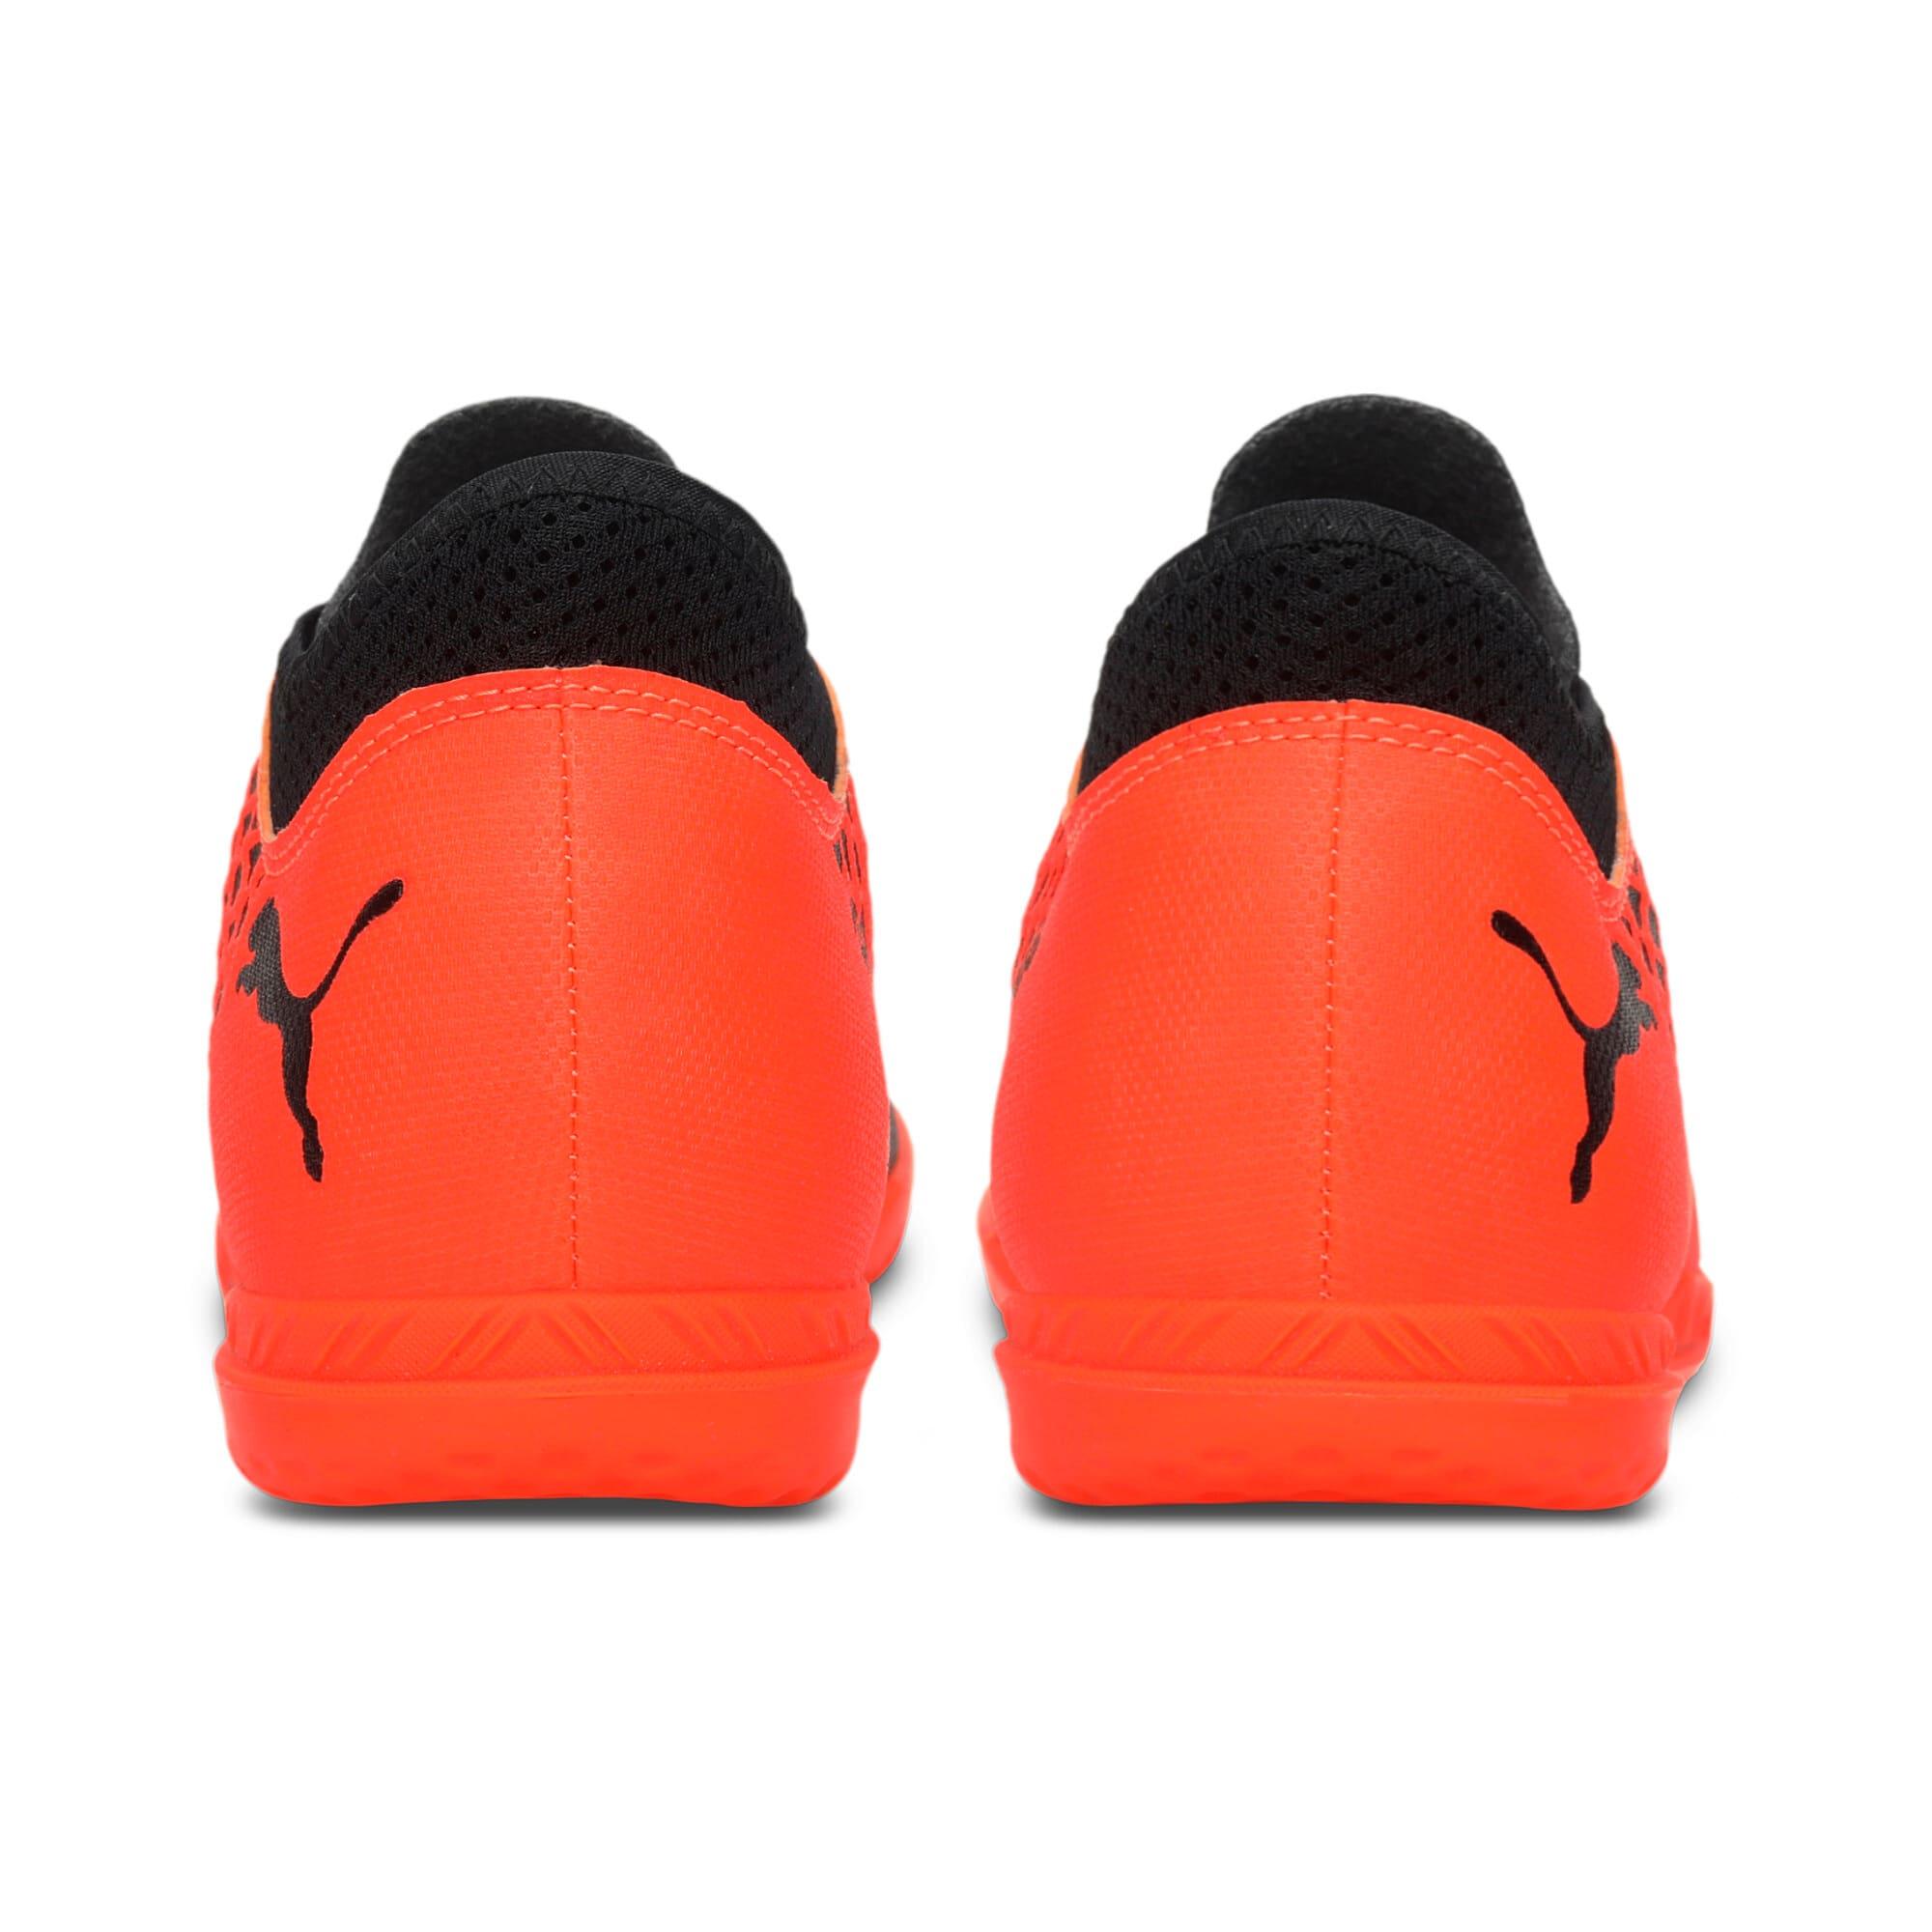 Thumbnail 3 of FUTURE 2.4 IT Kids' Football Shoes, Black-Orange, medium-IND